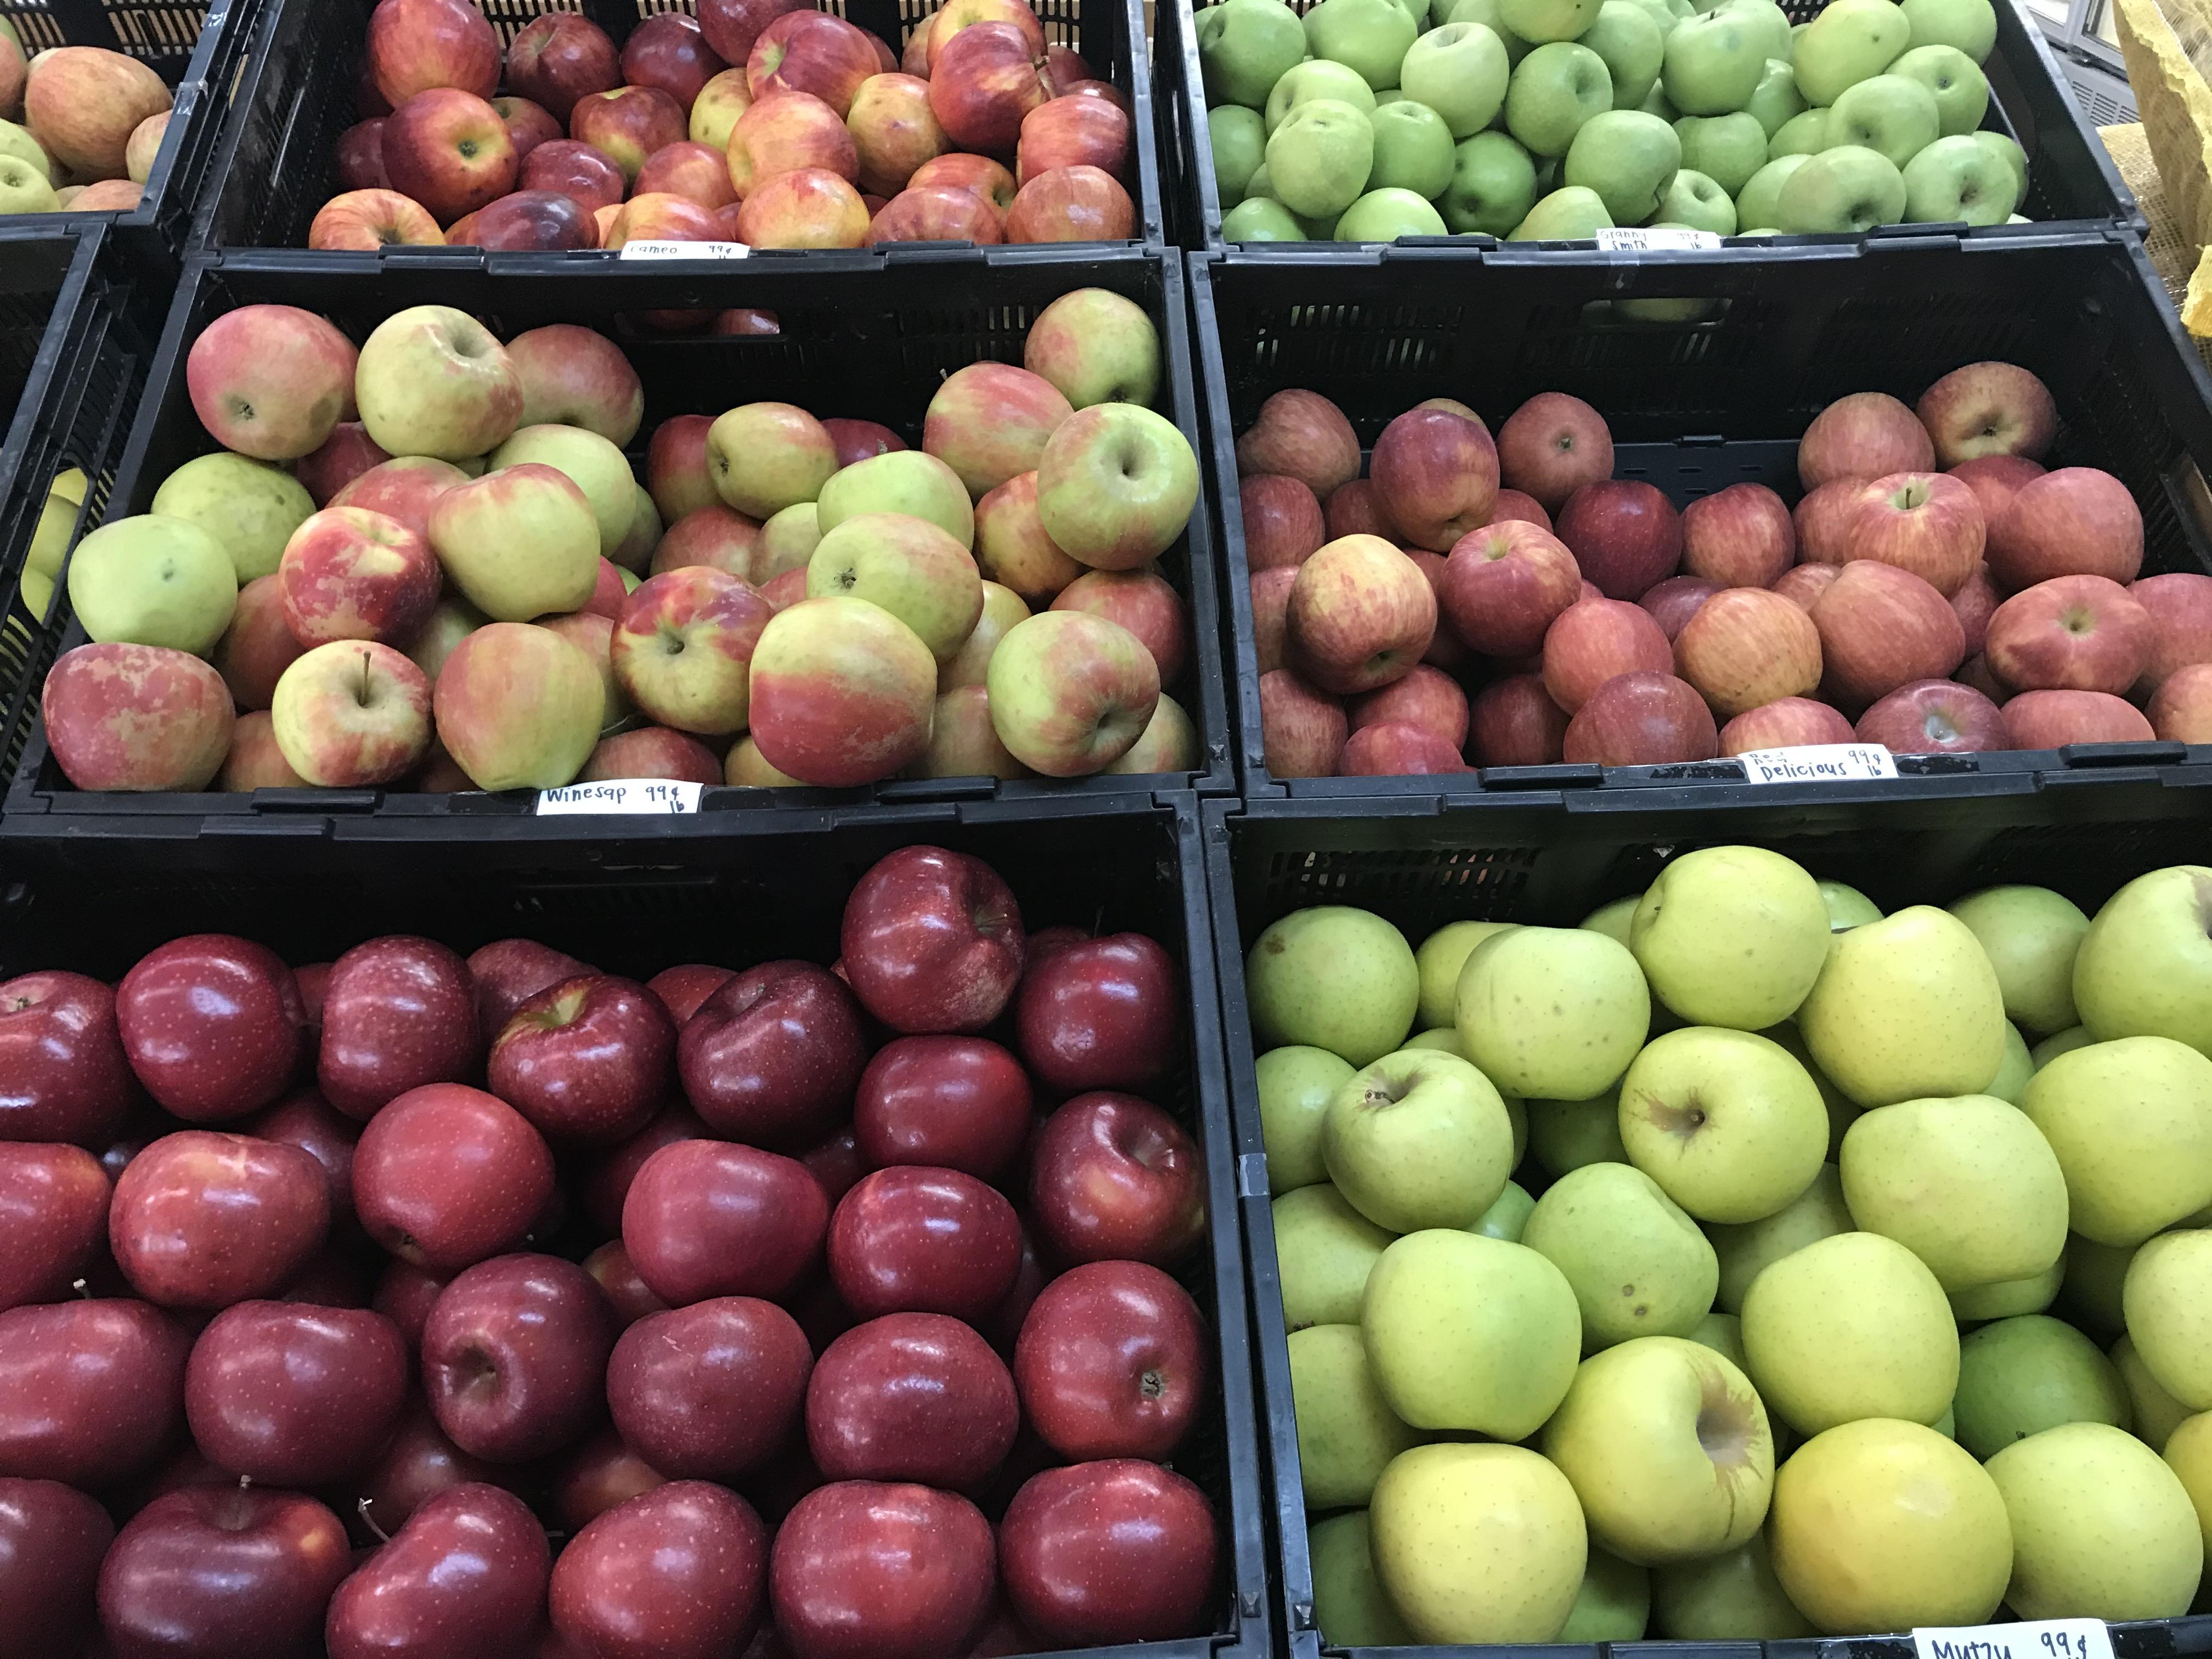 GA Mtn apples